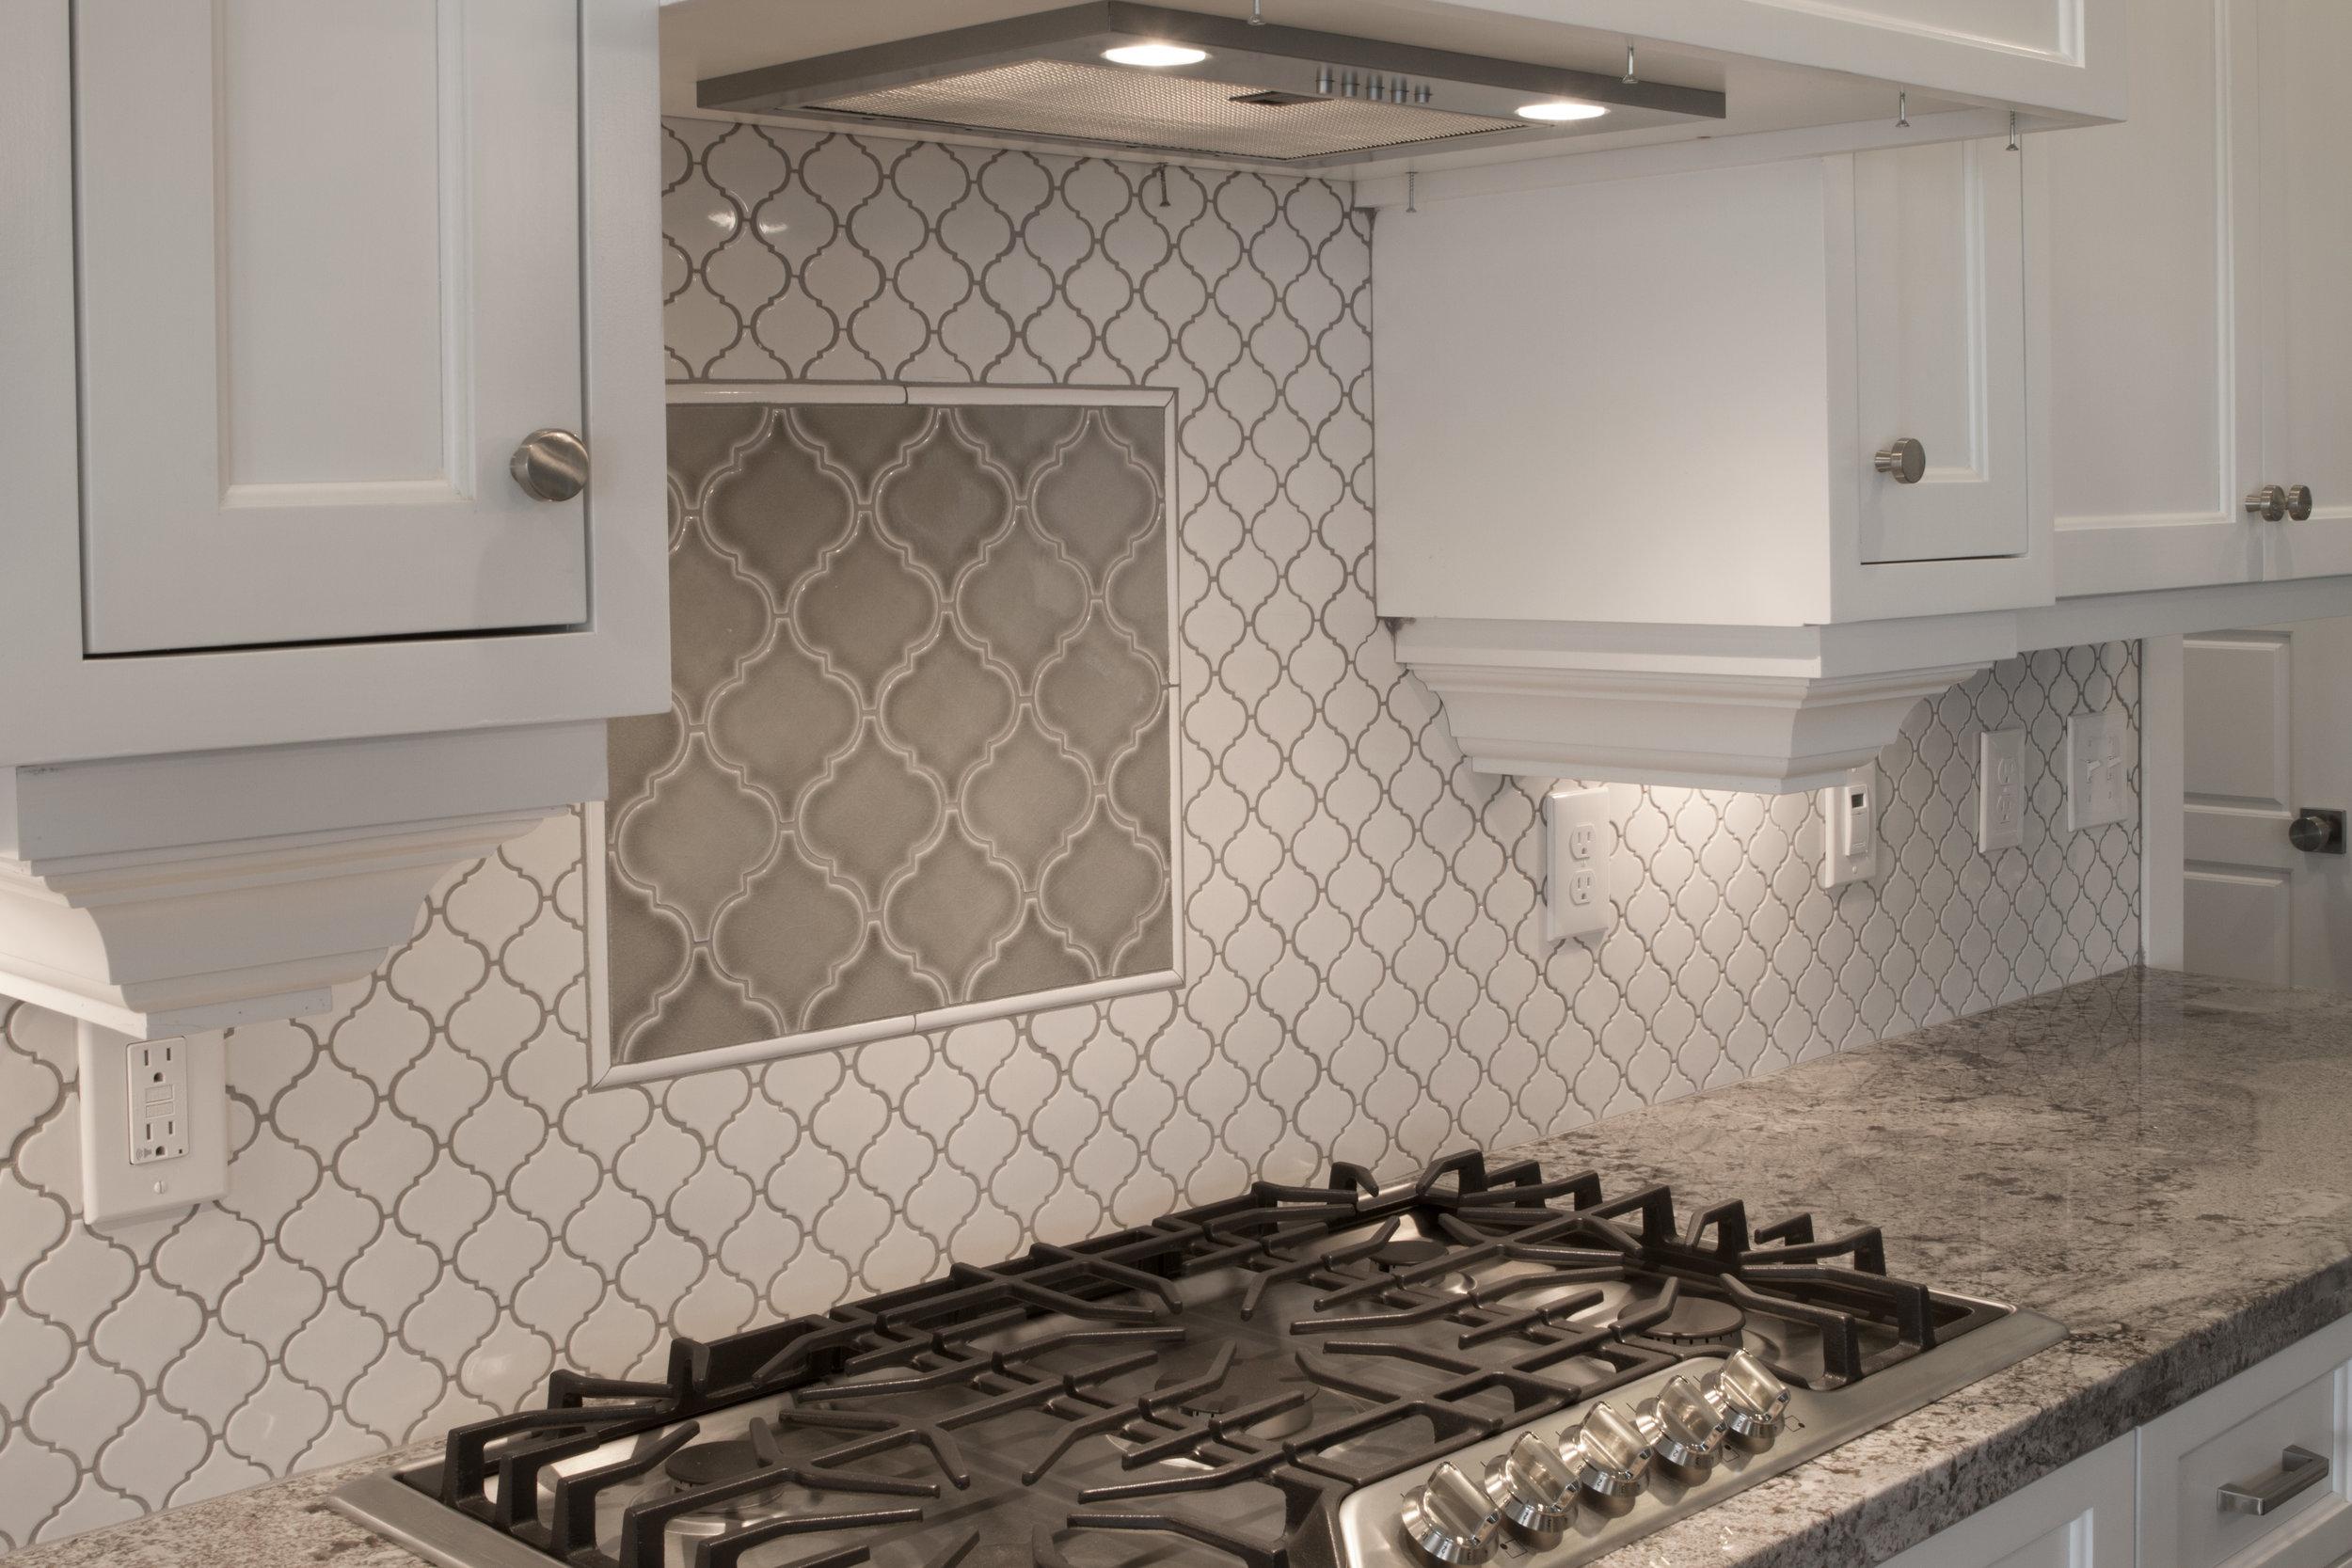 New Kitchen u0026 Bathroom Tile Backsplash Installation